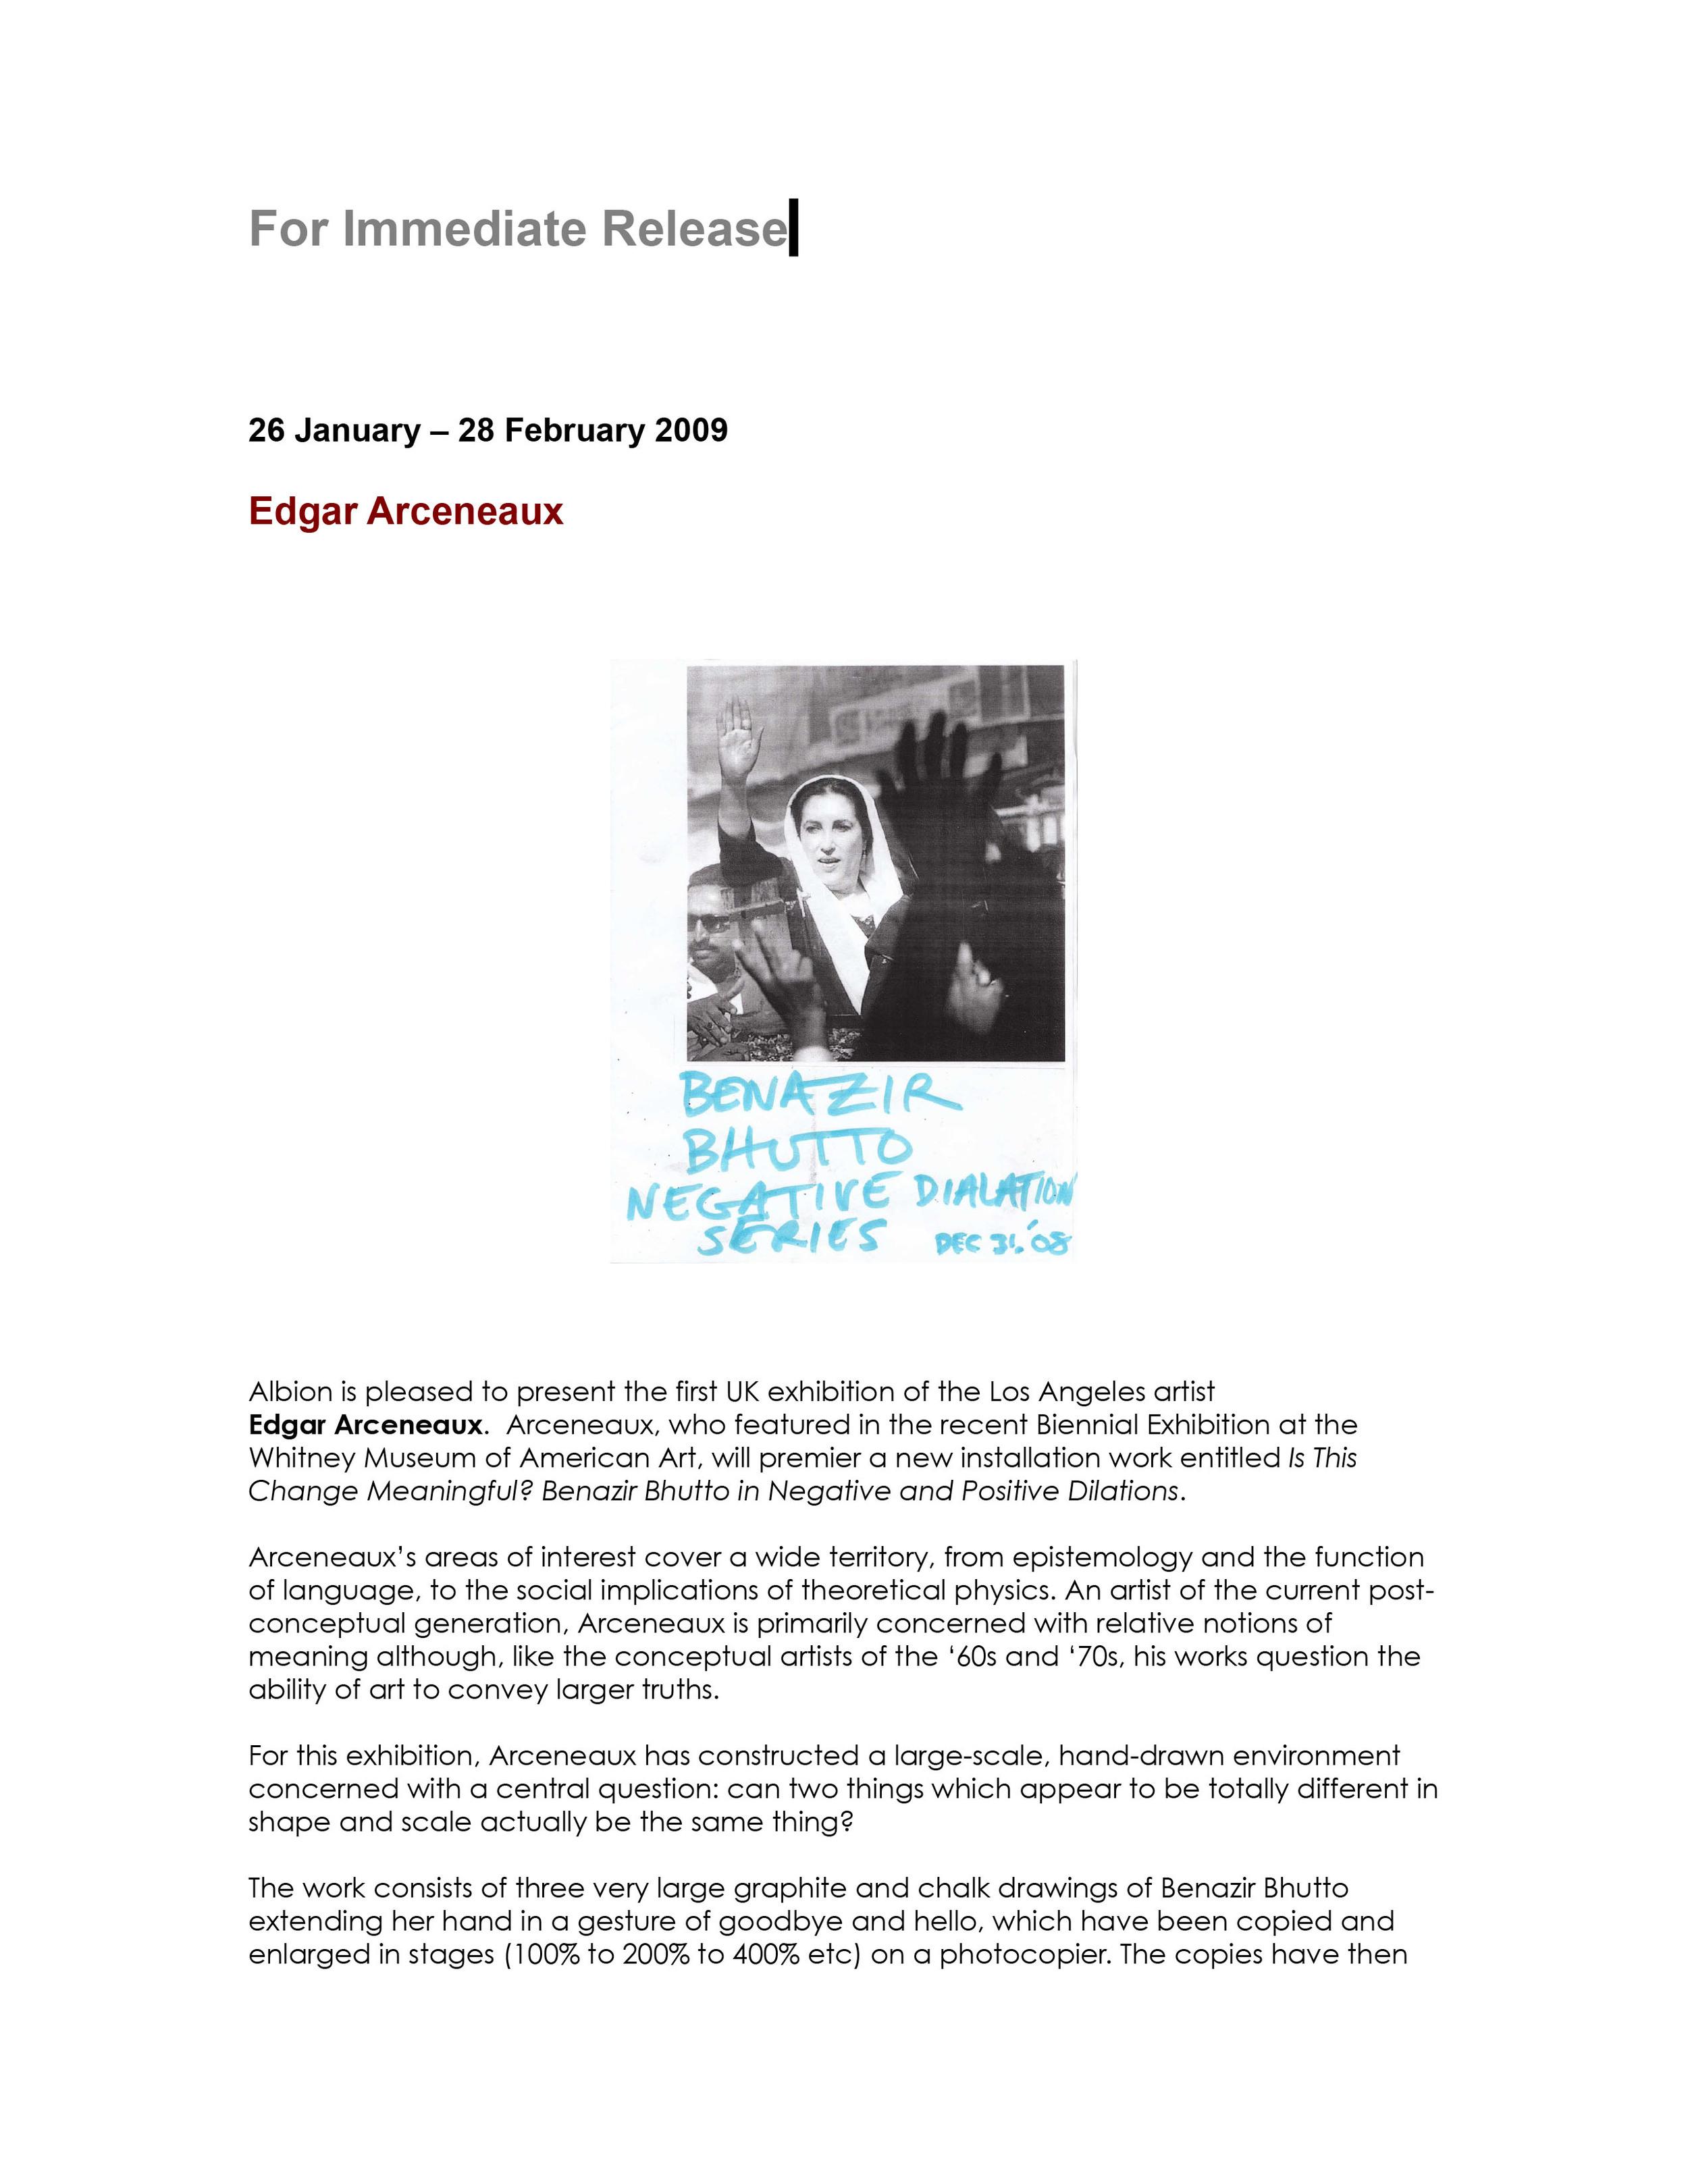 Edgar Arceneaux at Albion 26 January - 28 February, Press Release-1.jpg